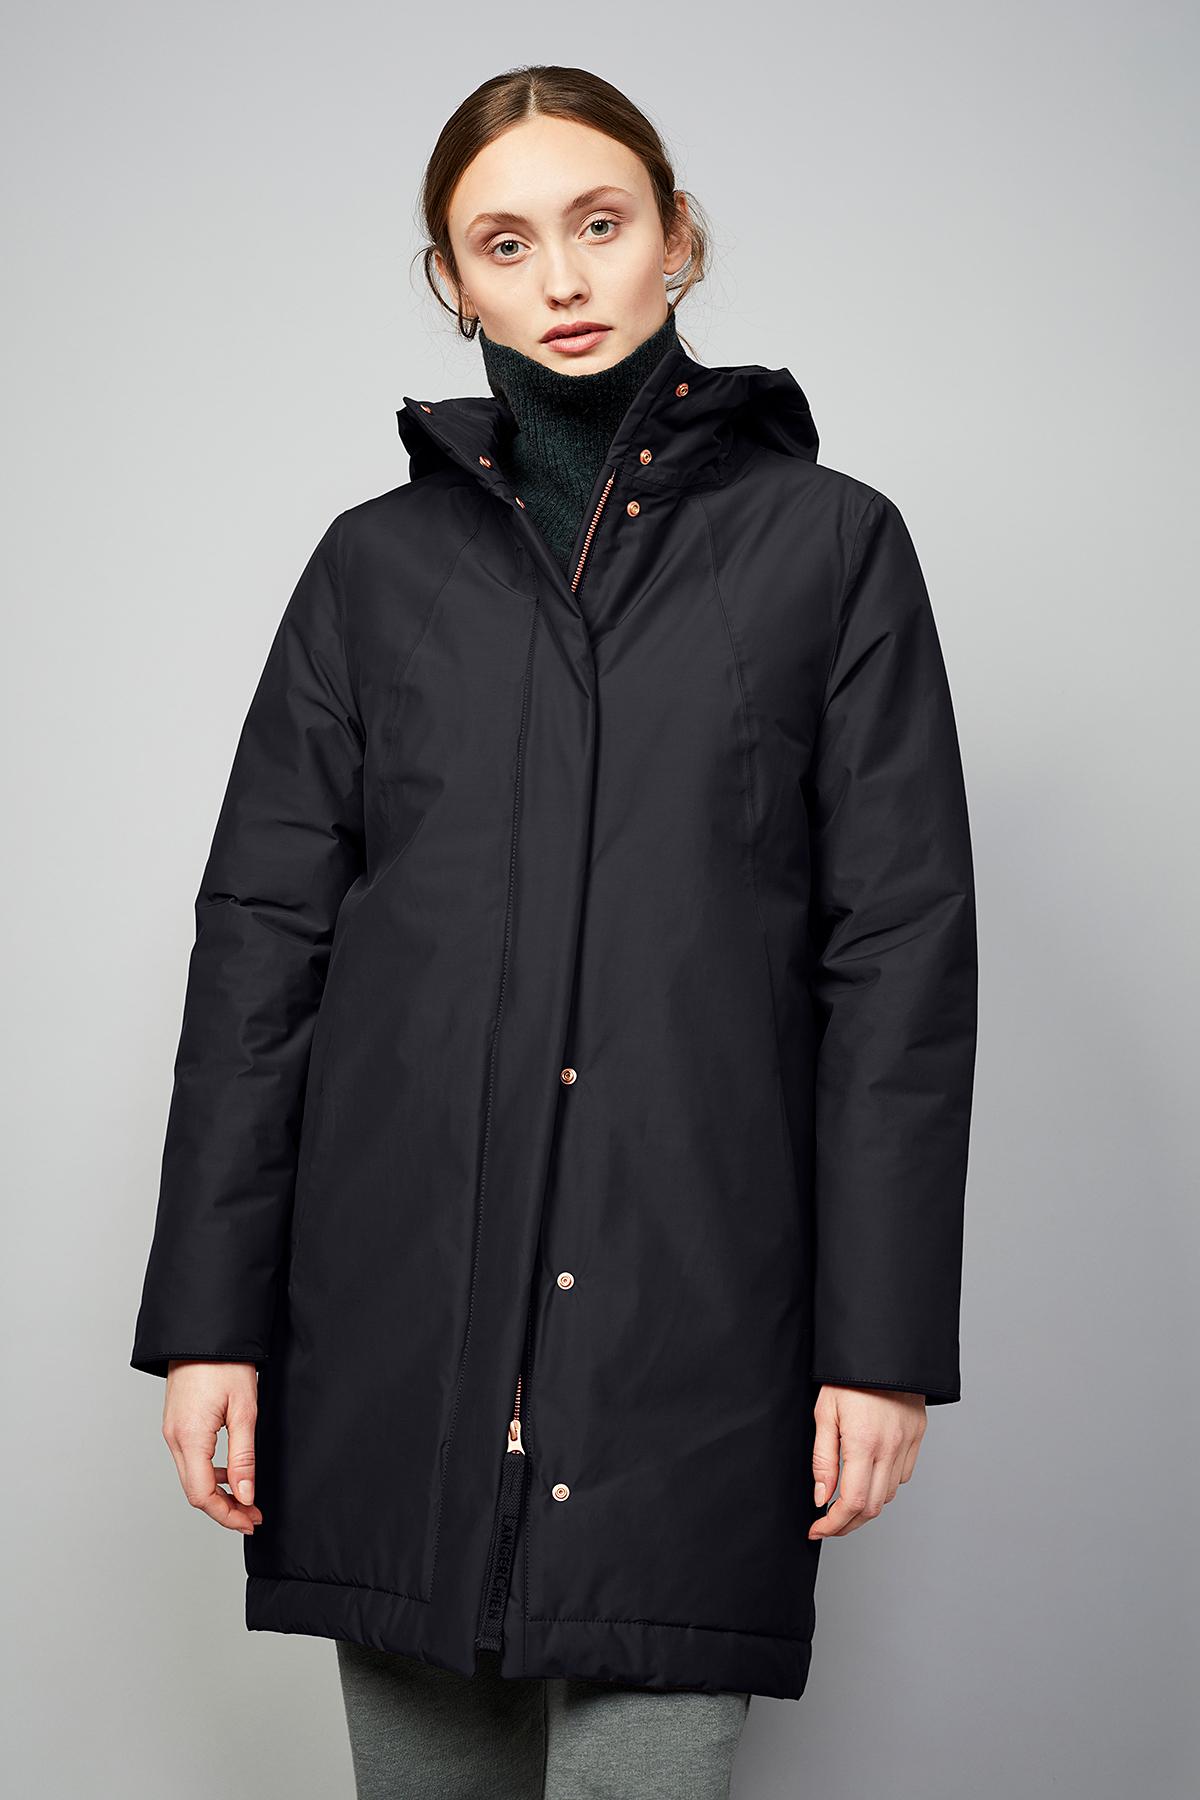 Wetterfester Damen-Mantel Ariza black